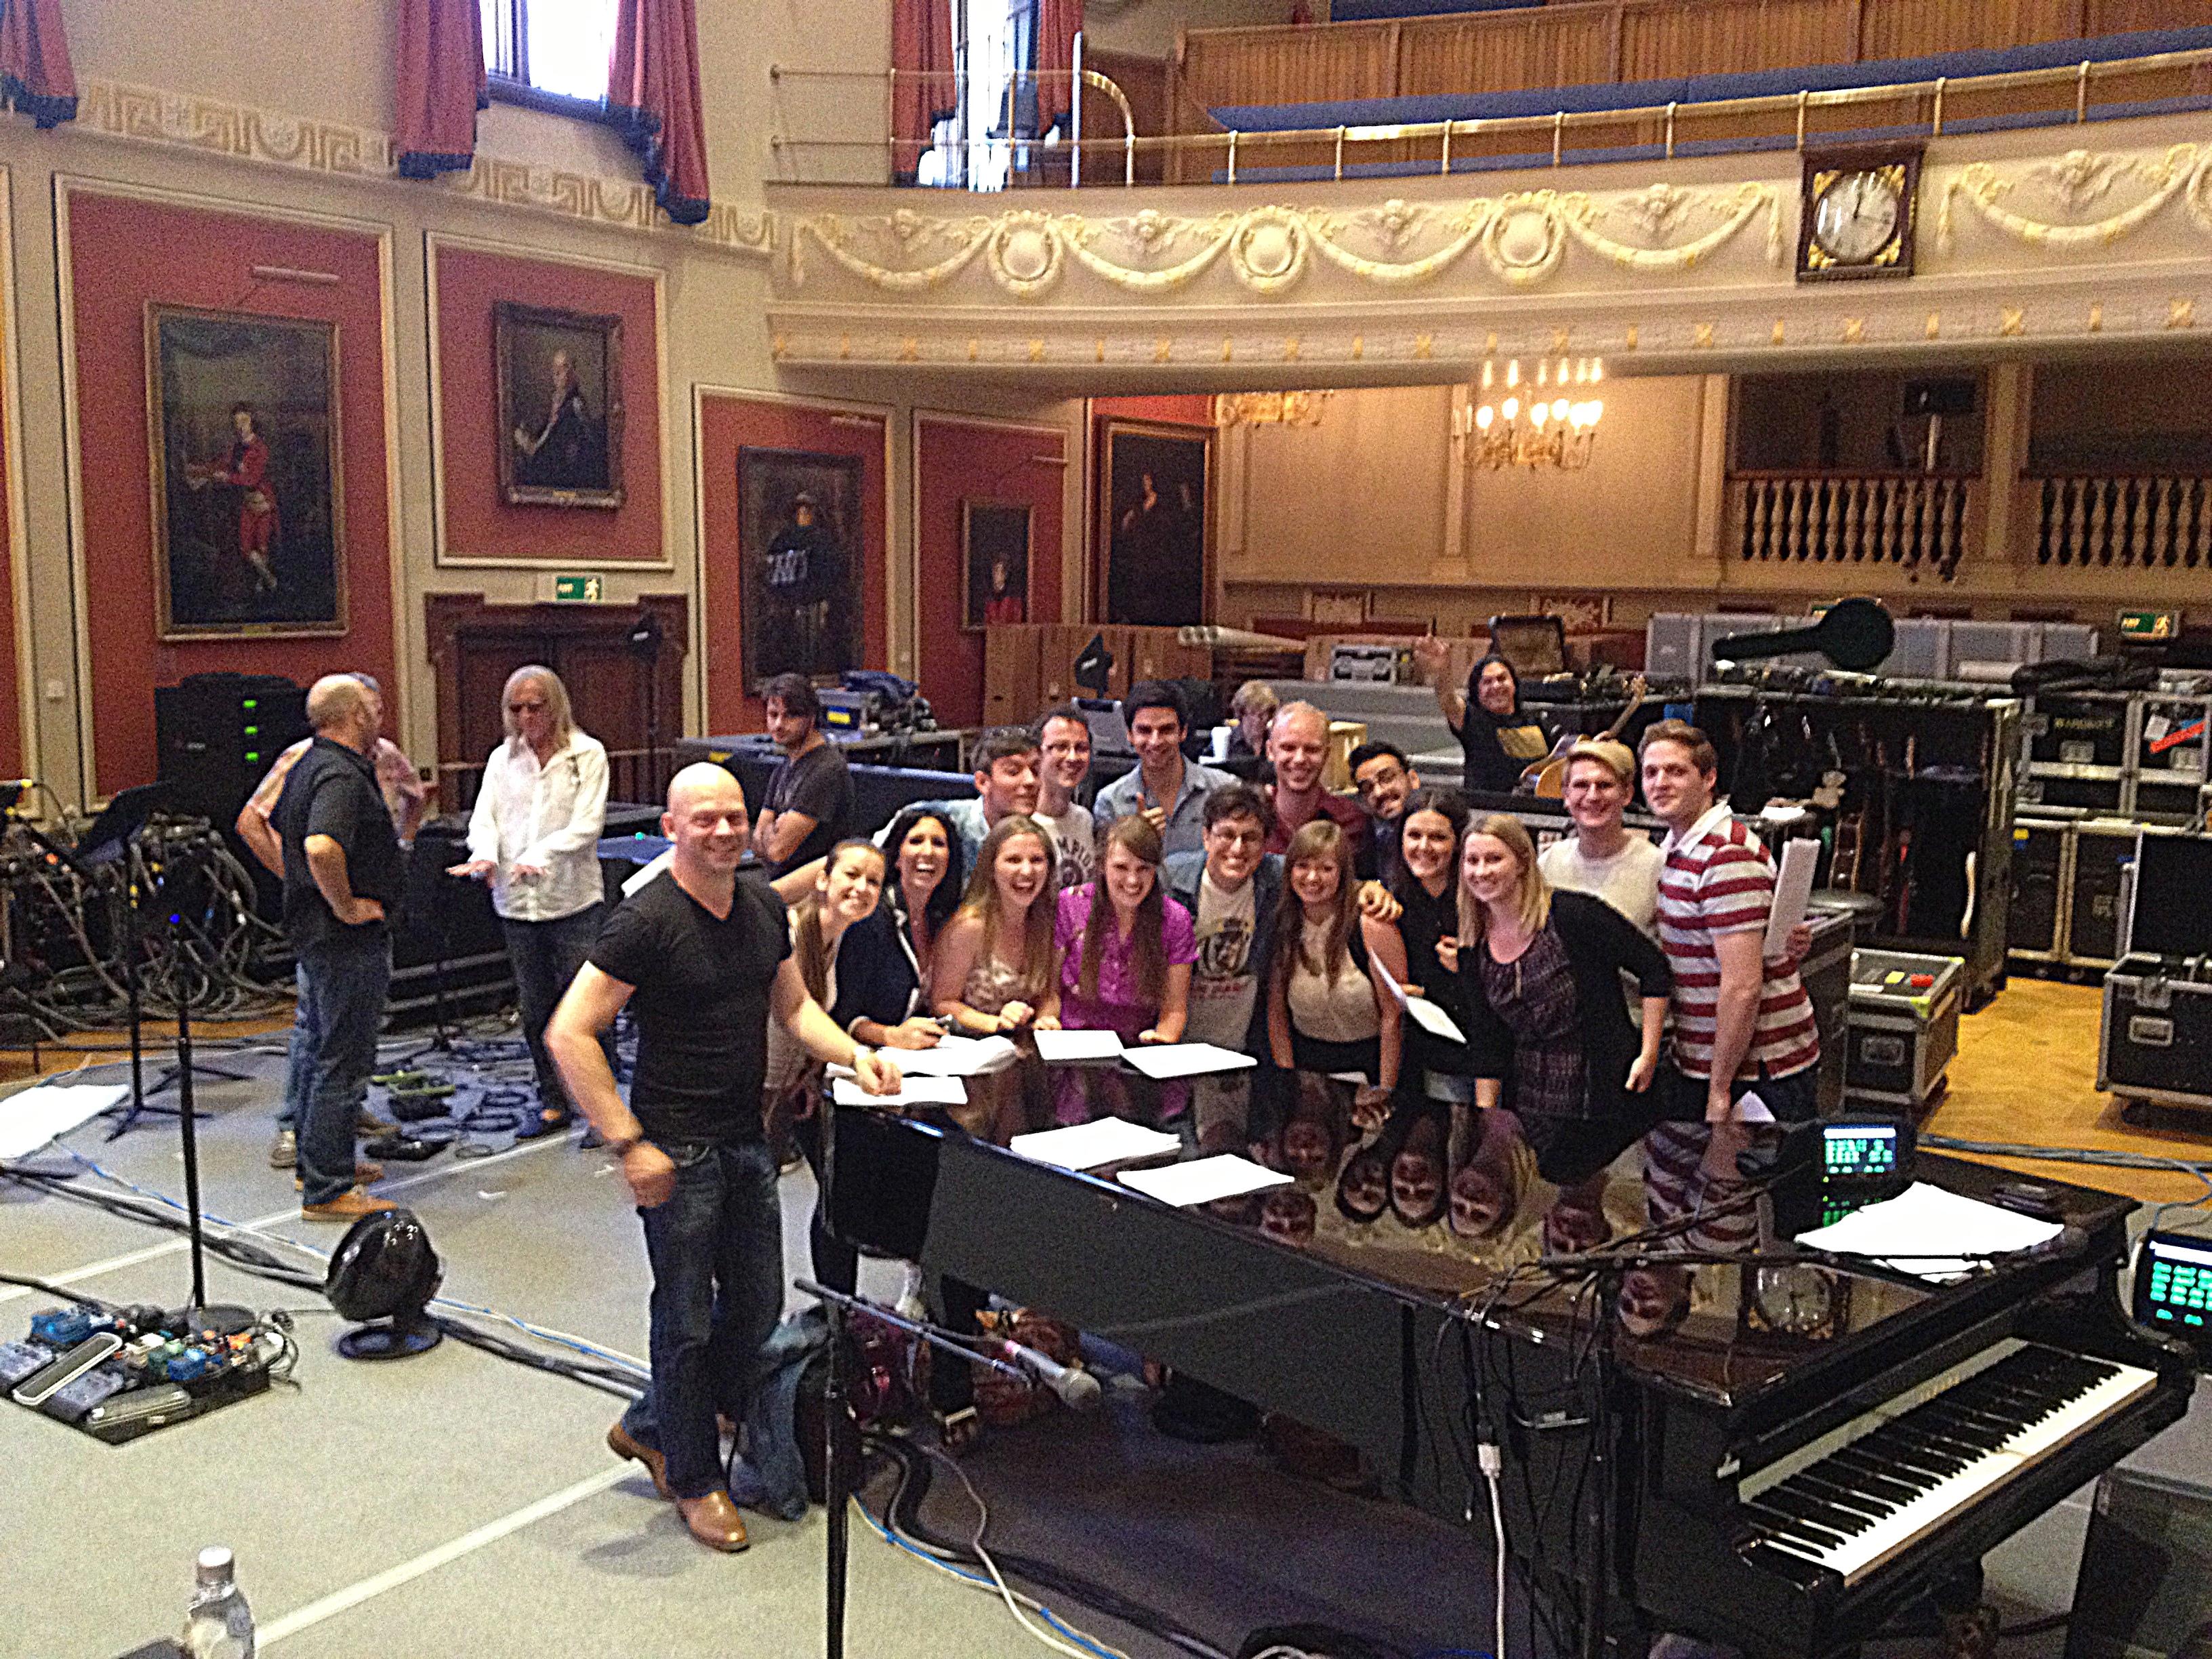 Royal Academy Choir with Adam in London 2013